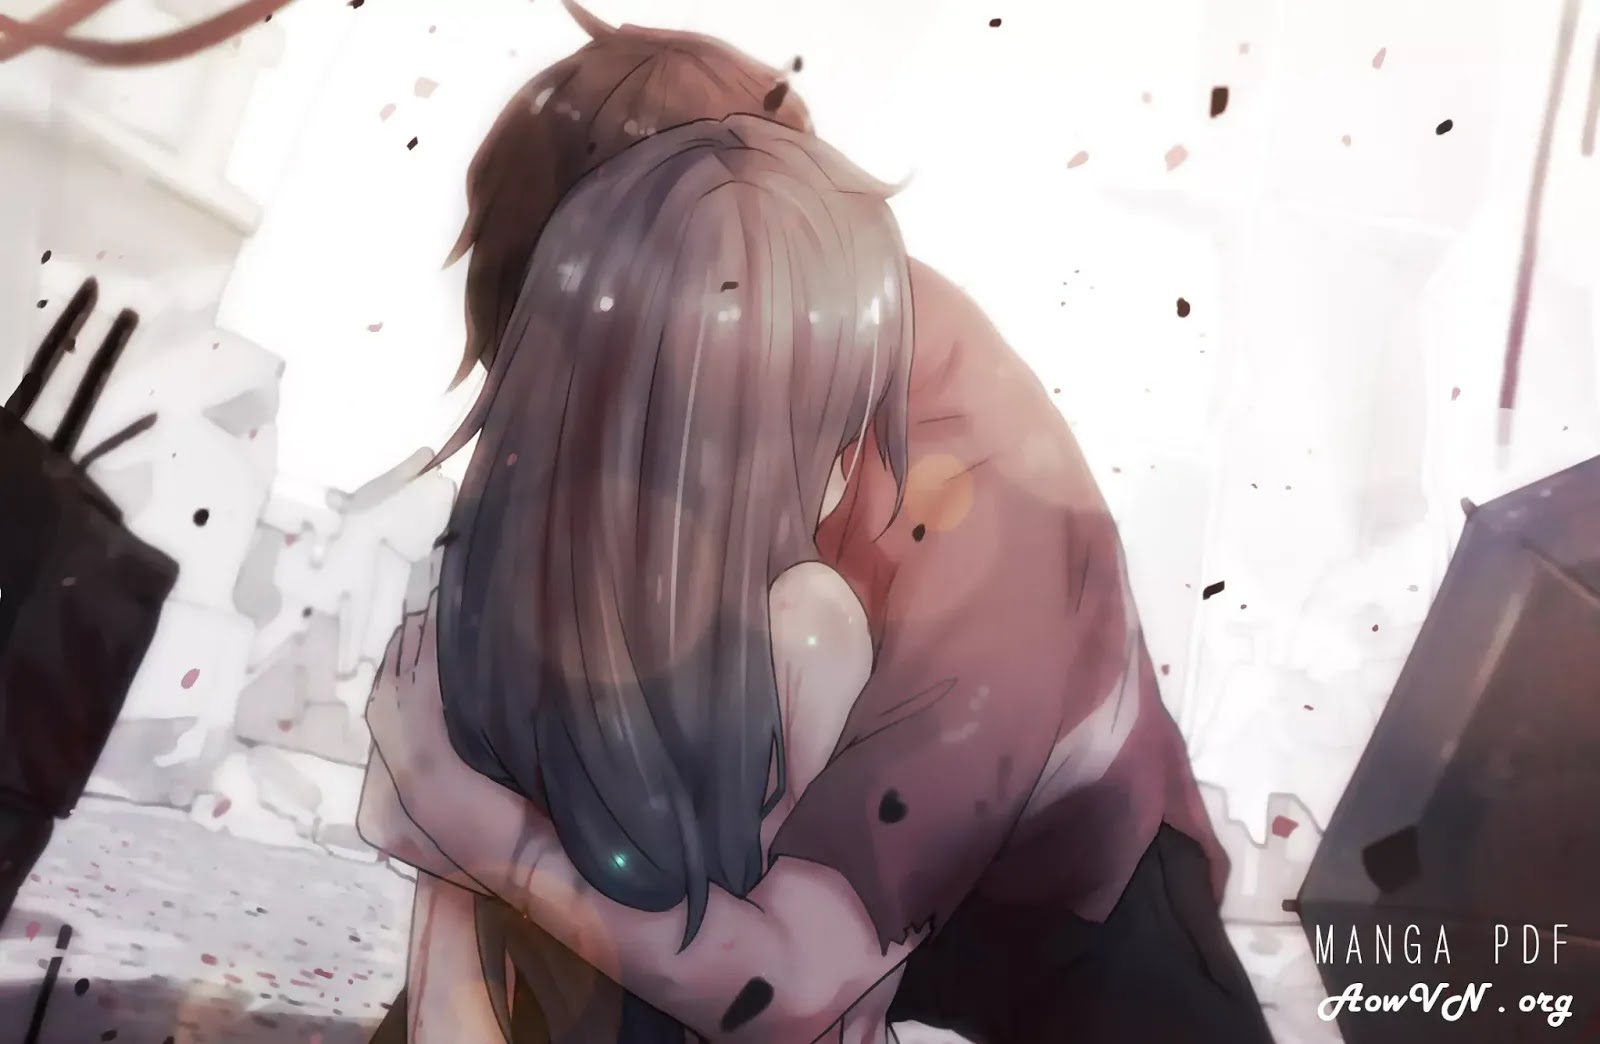 AowVN.org minz - [ Manga PDF ] Trọn bộ Maou na Ore to Fushihime no Yubiwa | Harem Hay